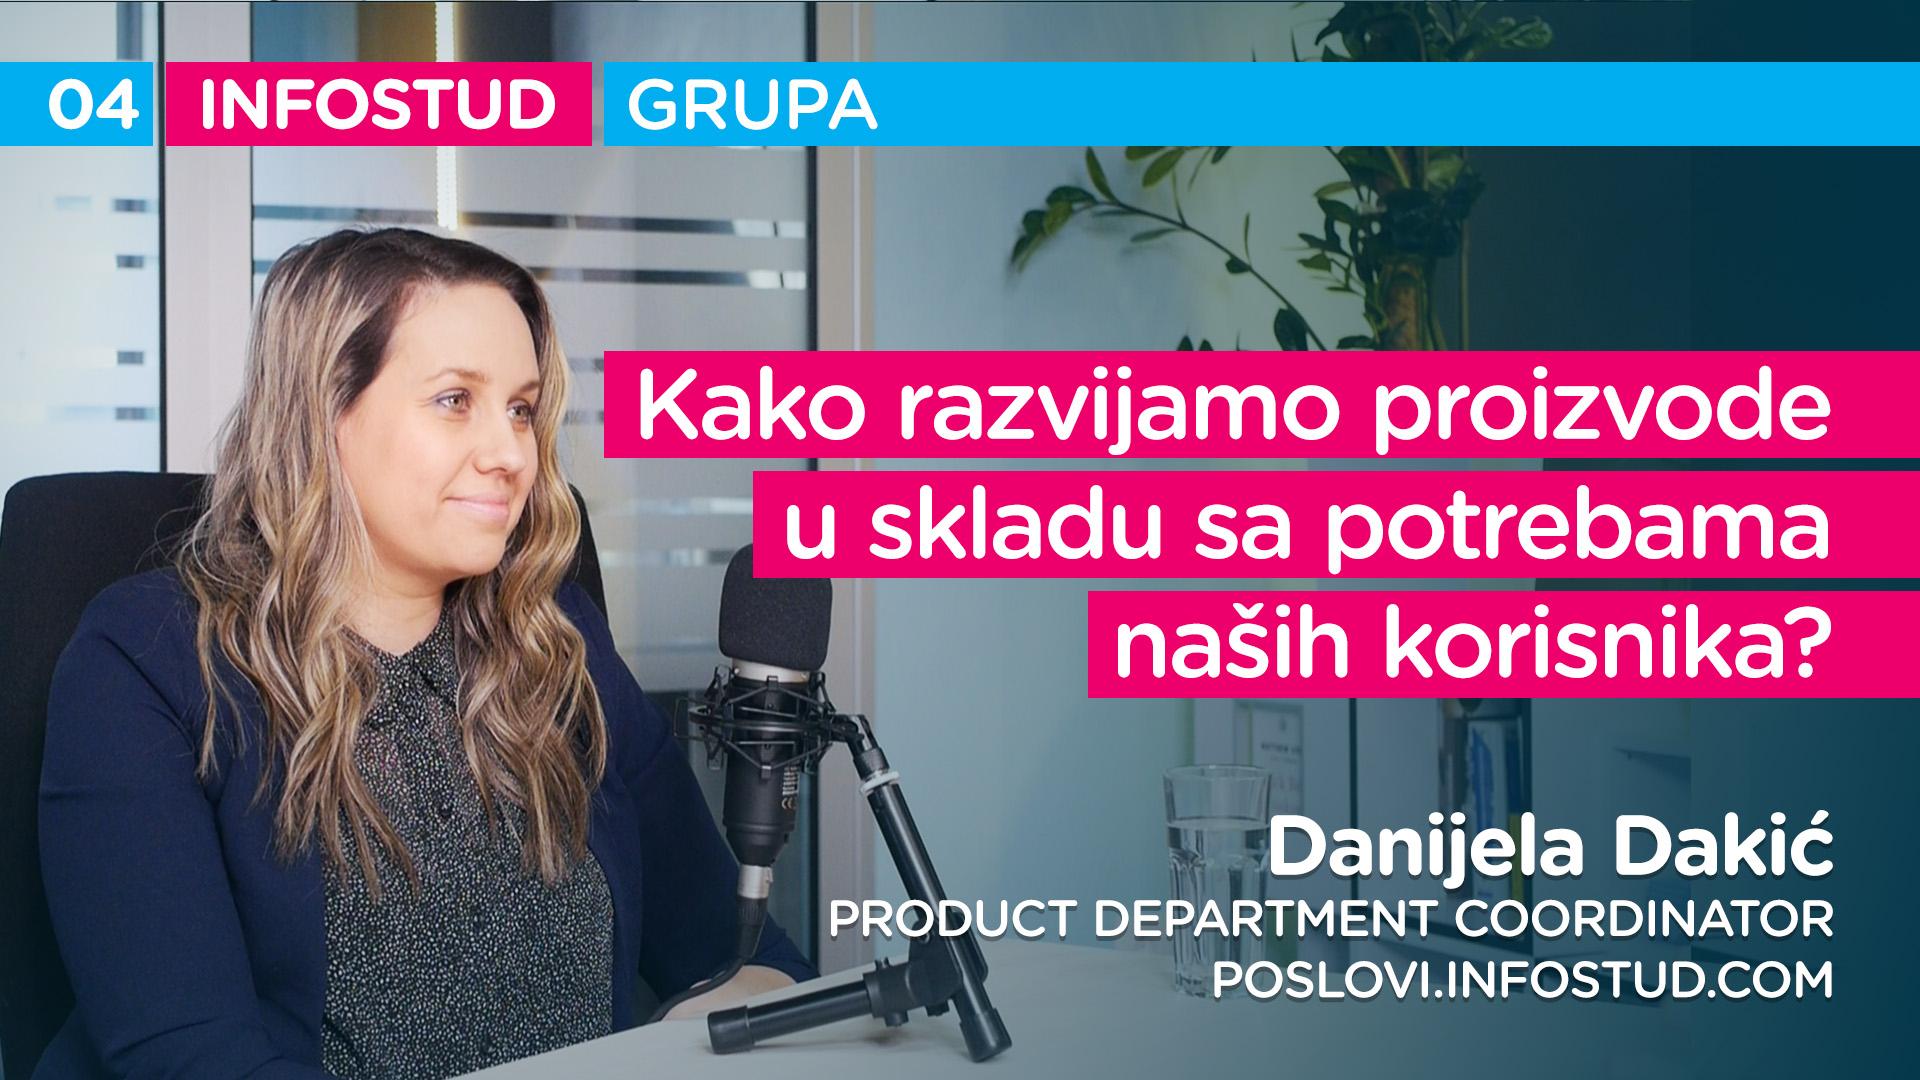 Infostud grupa specijal EP004: Danijela Dakić